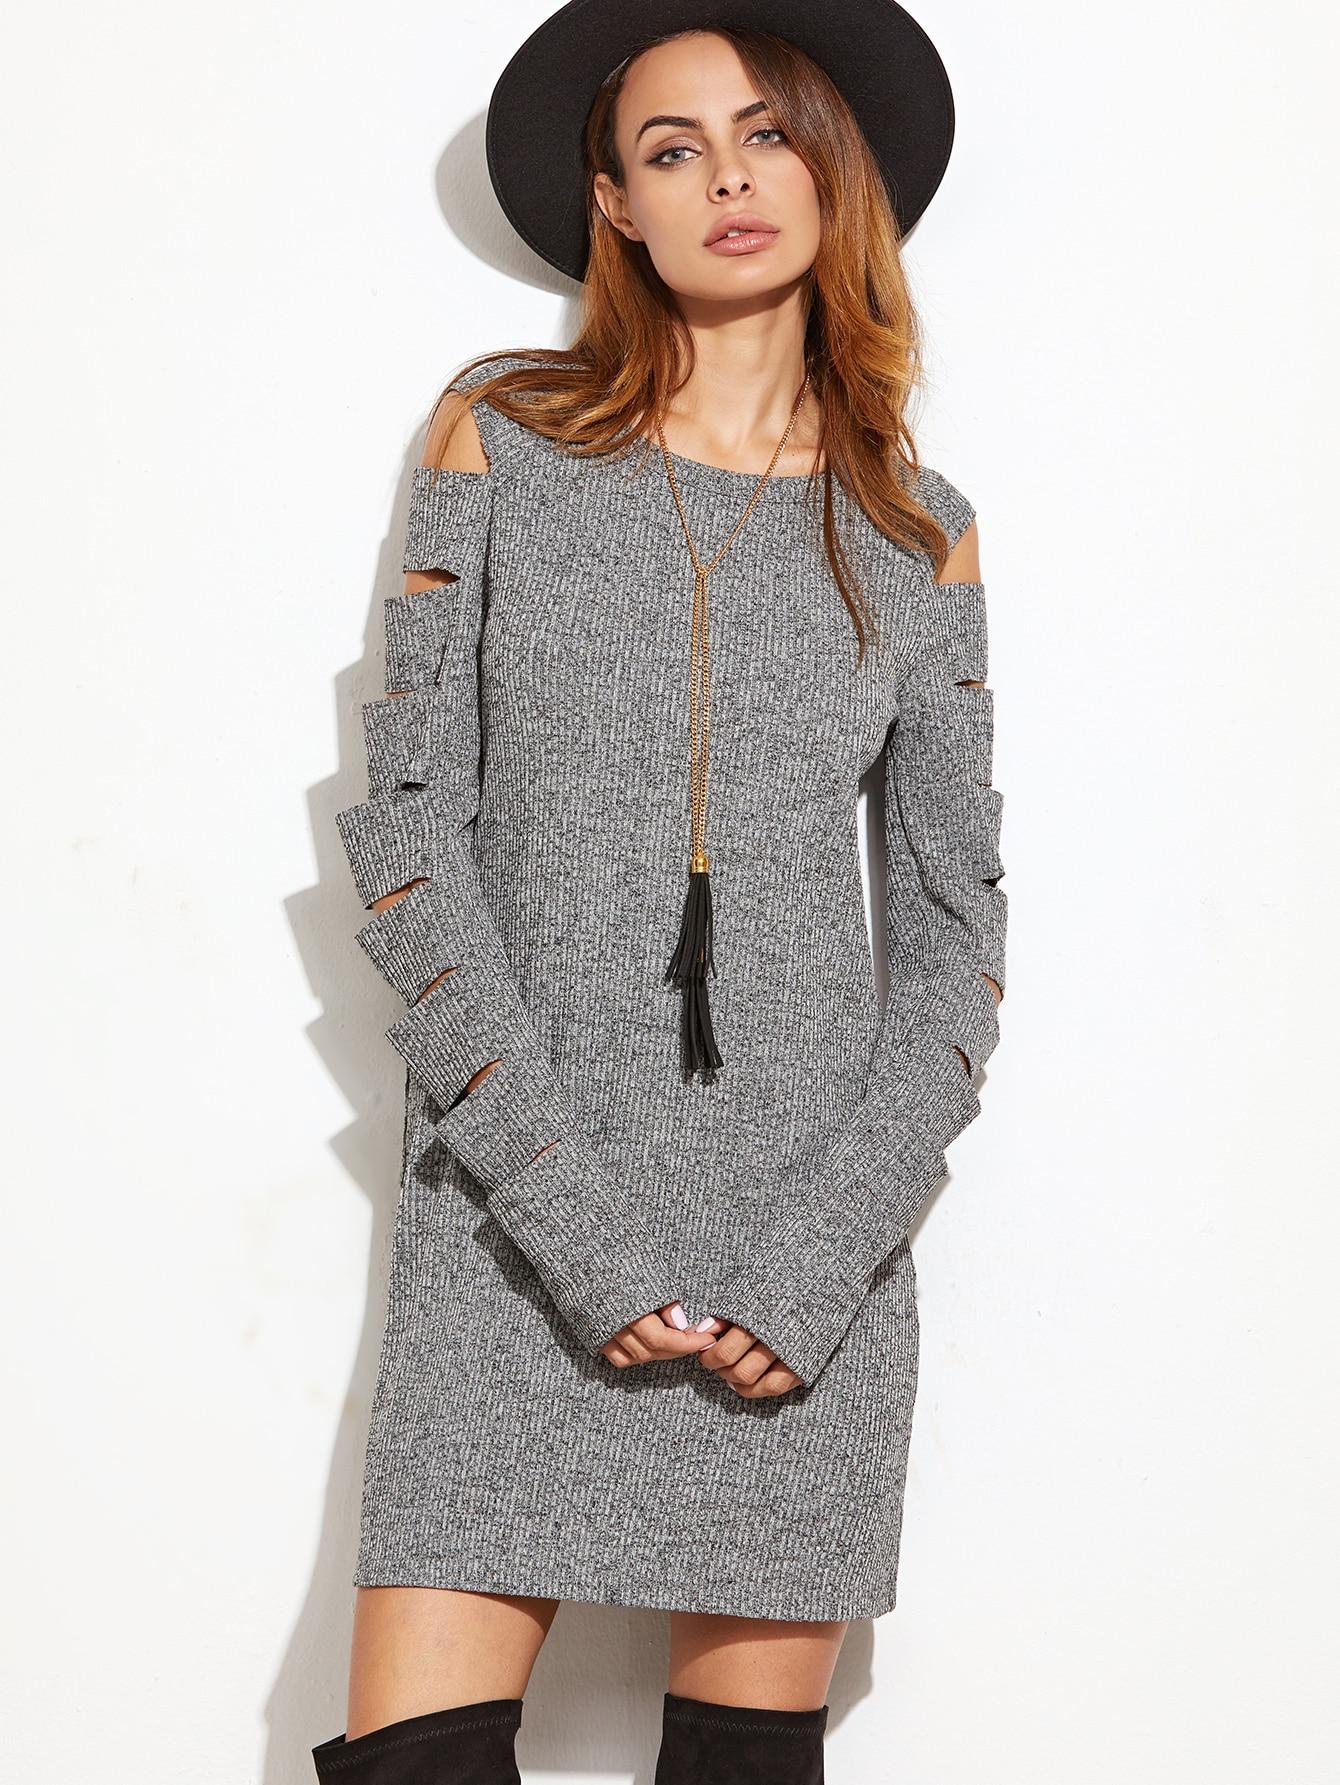 Ladder Cutout Sleeve Ribbed Knit Dress dress161110707